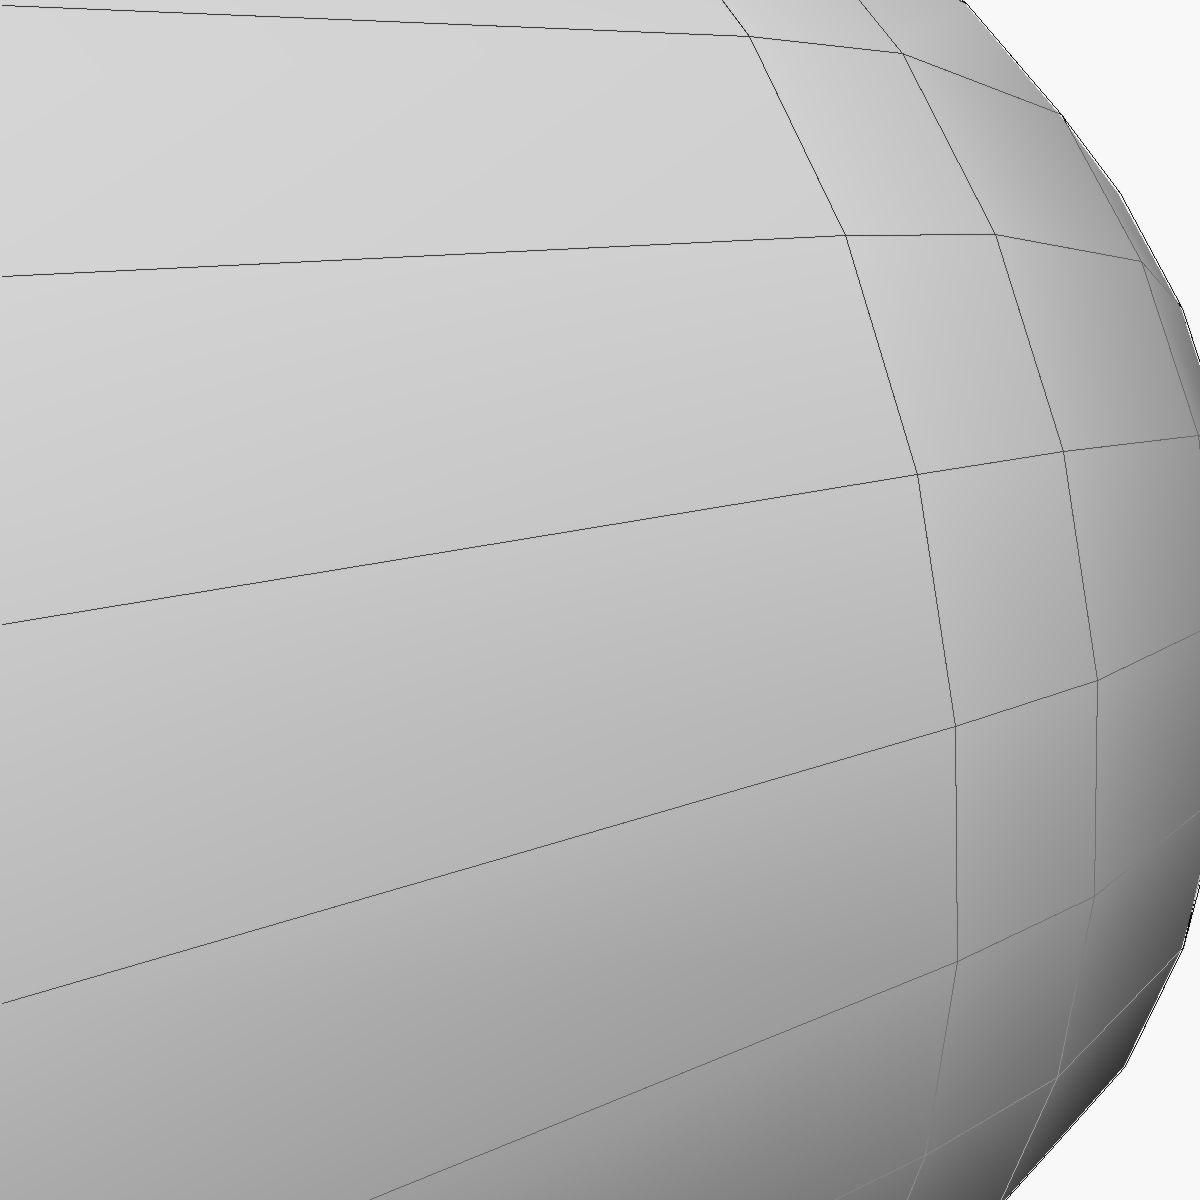 Bomb, Jolly Roger scheme 3d model 3ds dxf fbx blend cob dae X obj 162679